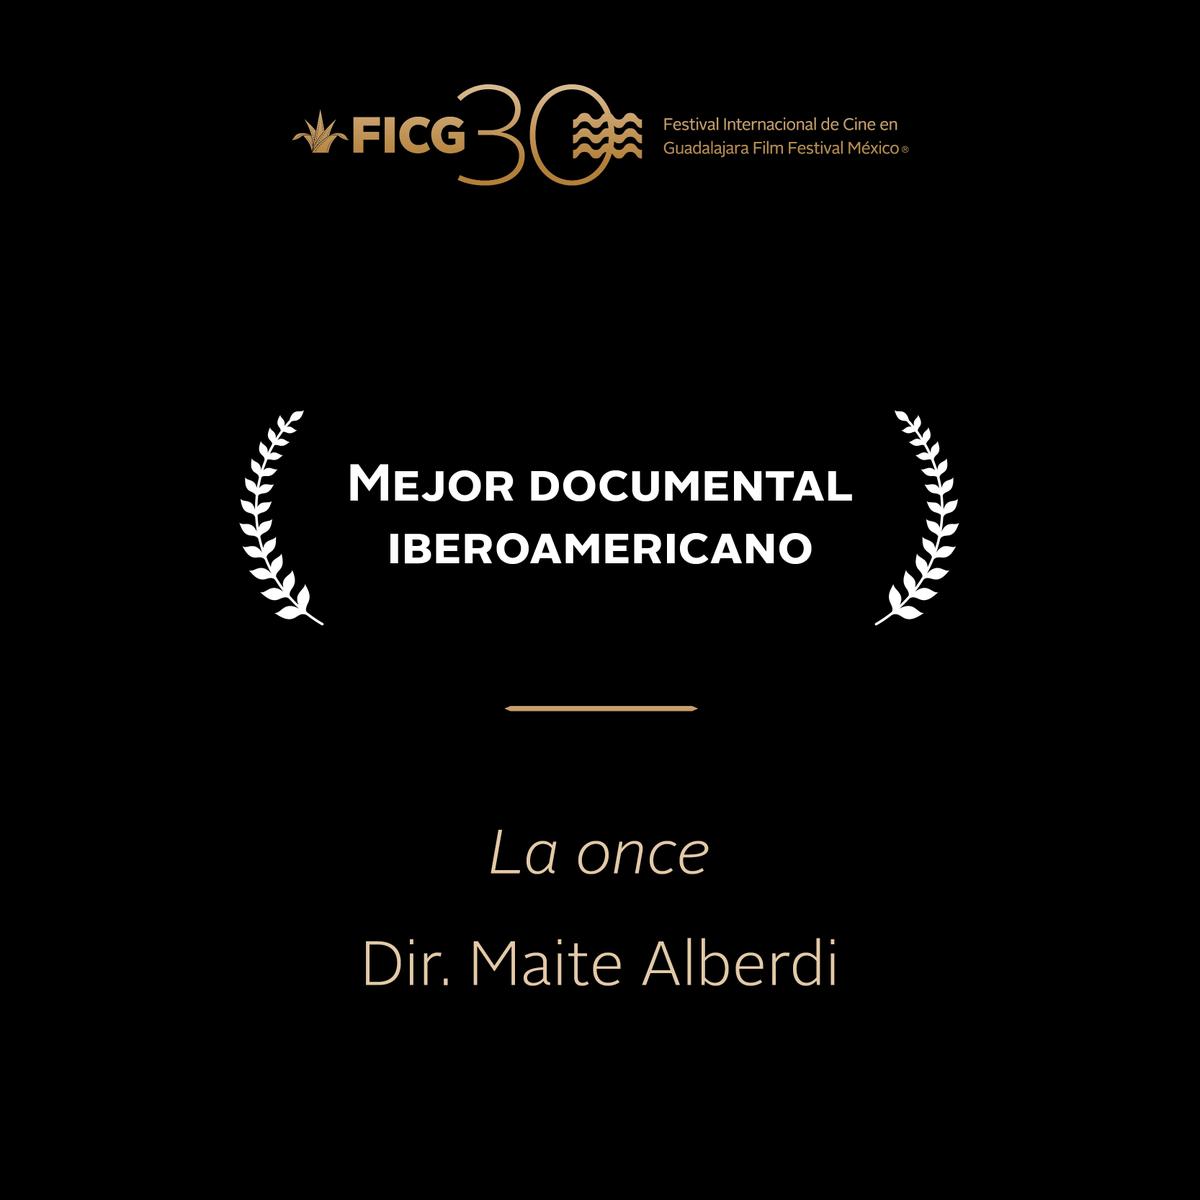 #FICG30  - Premio Mejor Documental Iberoamericano  ''La Once'' / Dir. Maite Alberdi. http://t.co/gMIg05YKoG